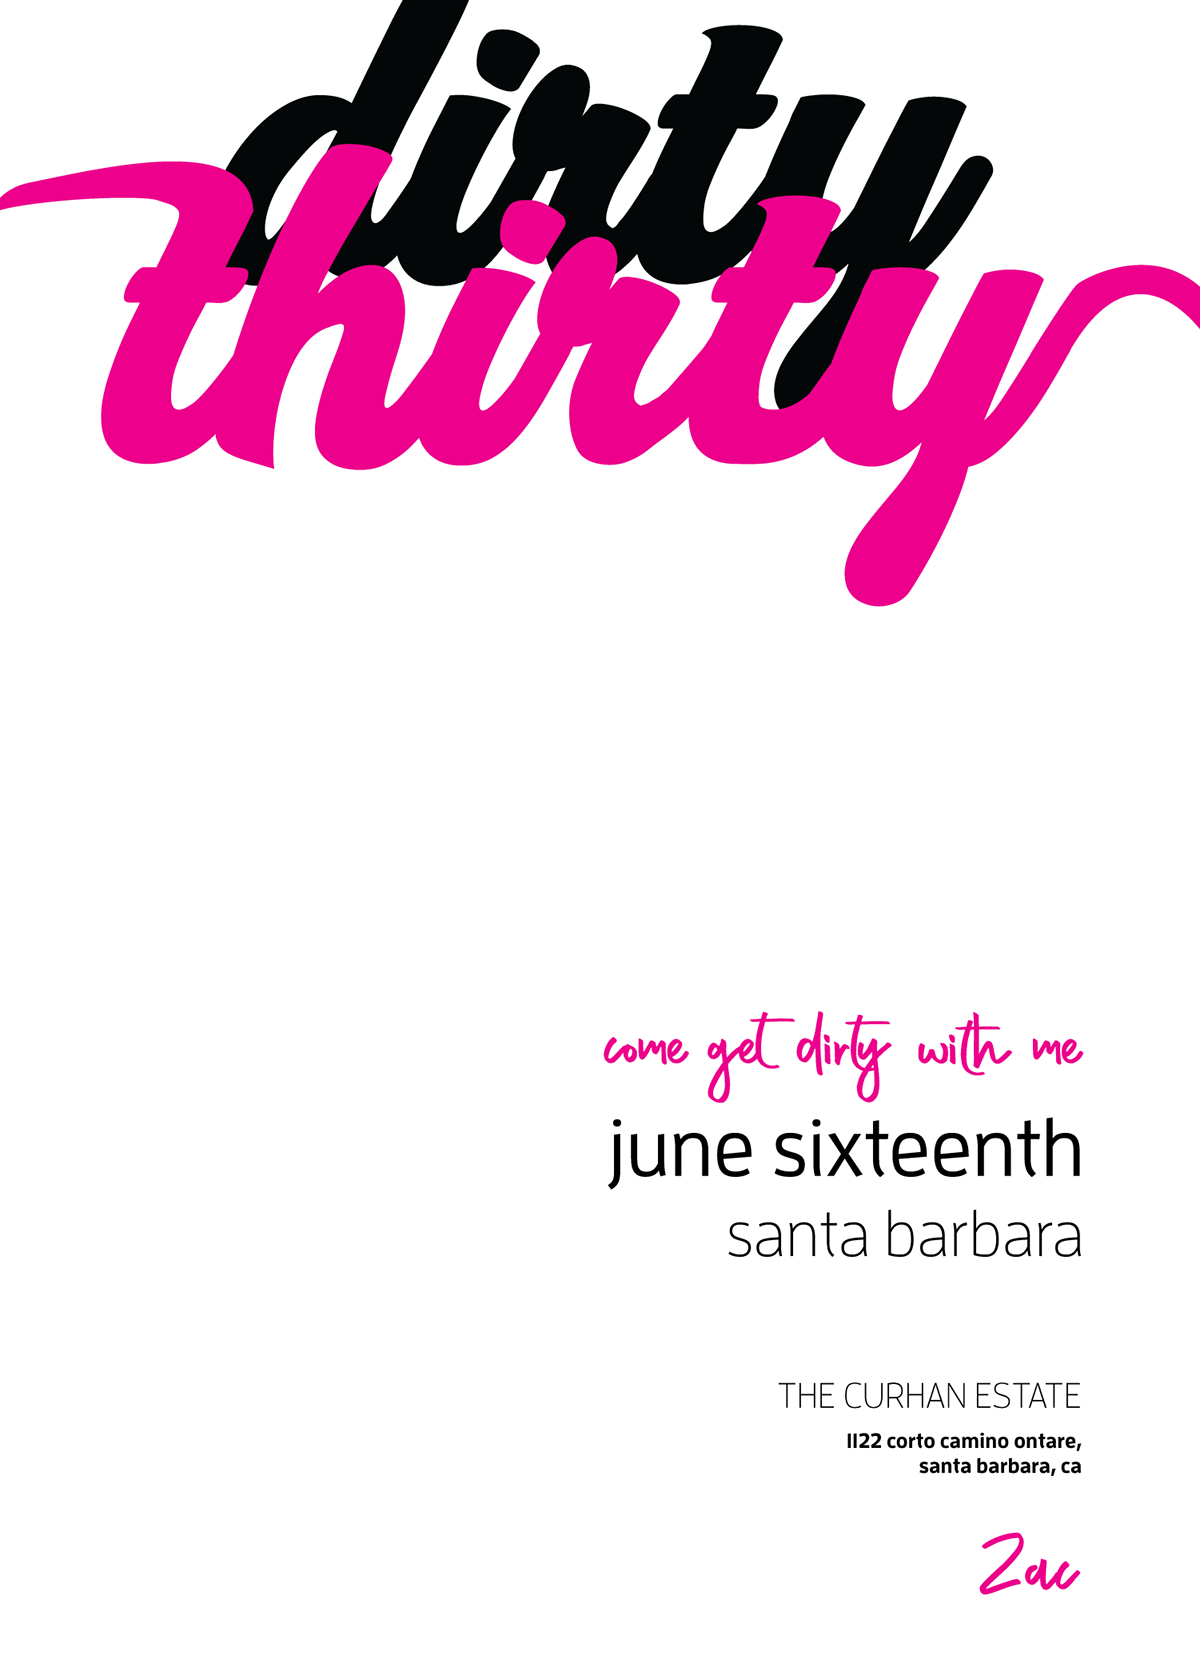 Dirty Thirty Birthday Invite On Behance